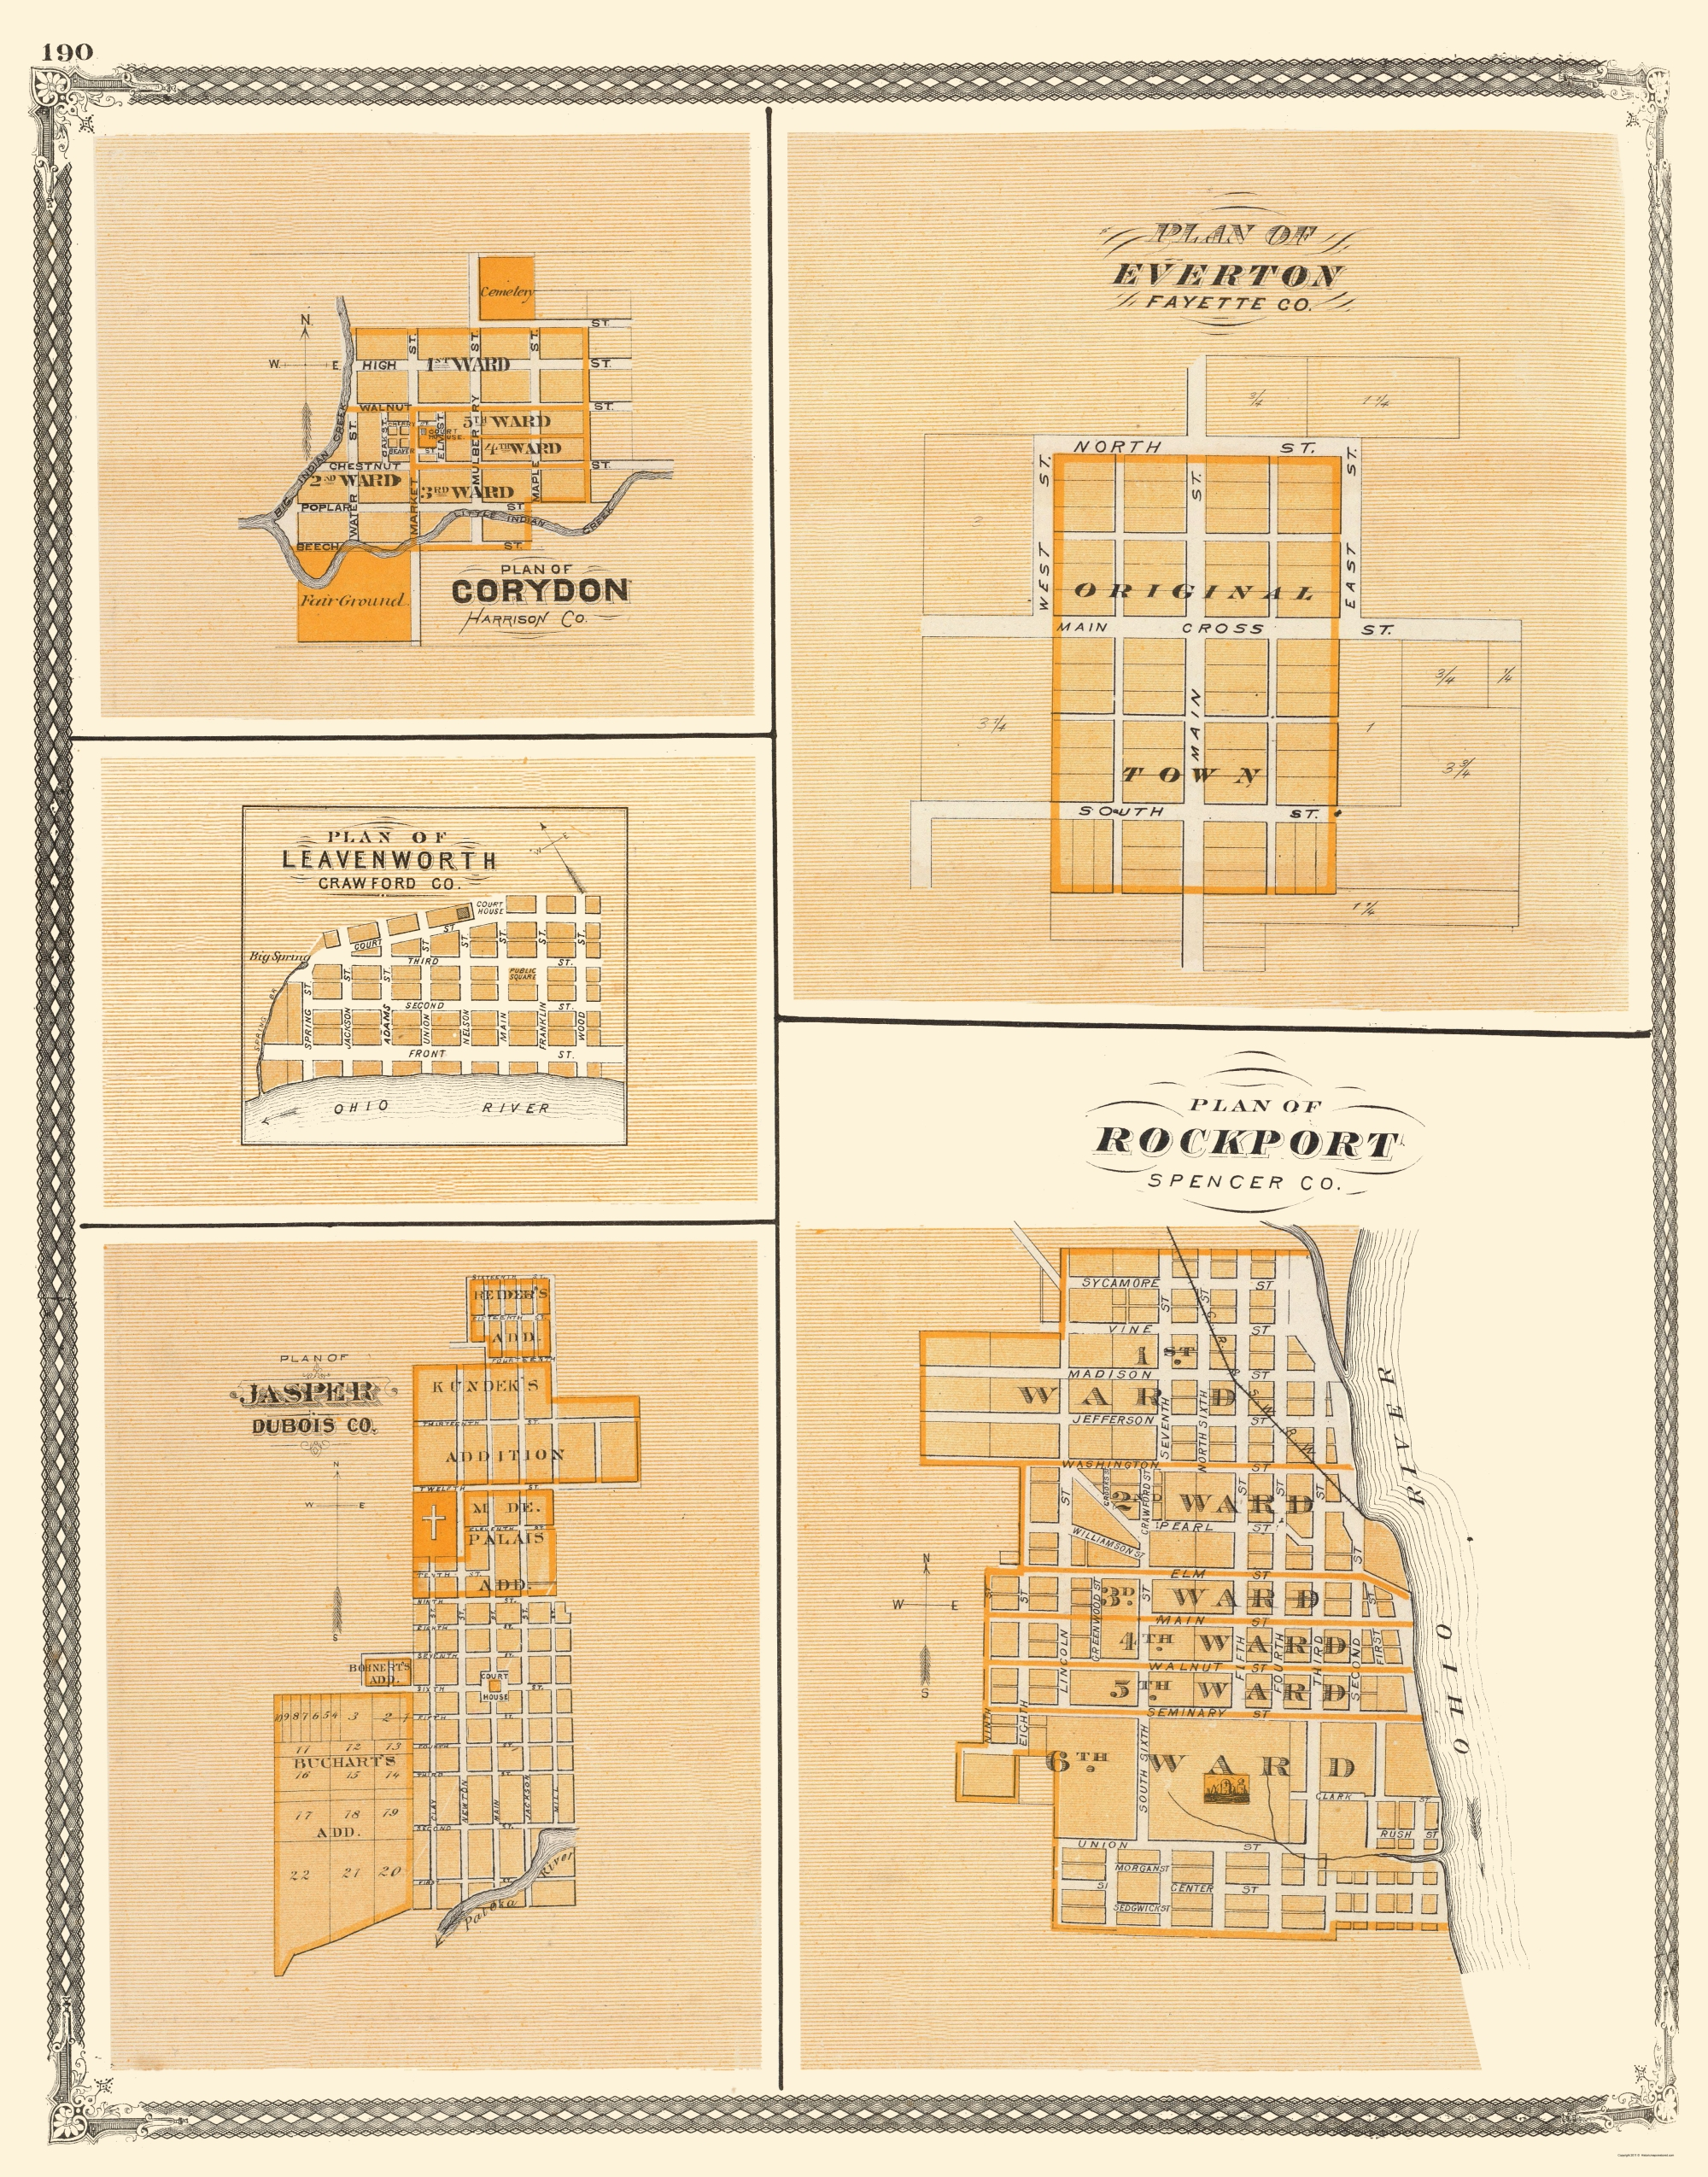 Old Map Corydon Everton Leavenworth Jasper Indiana